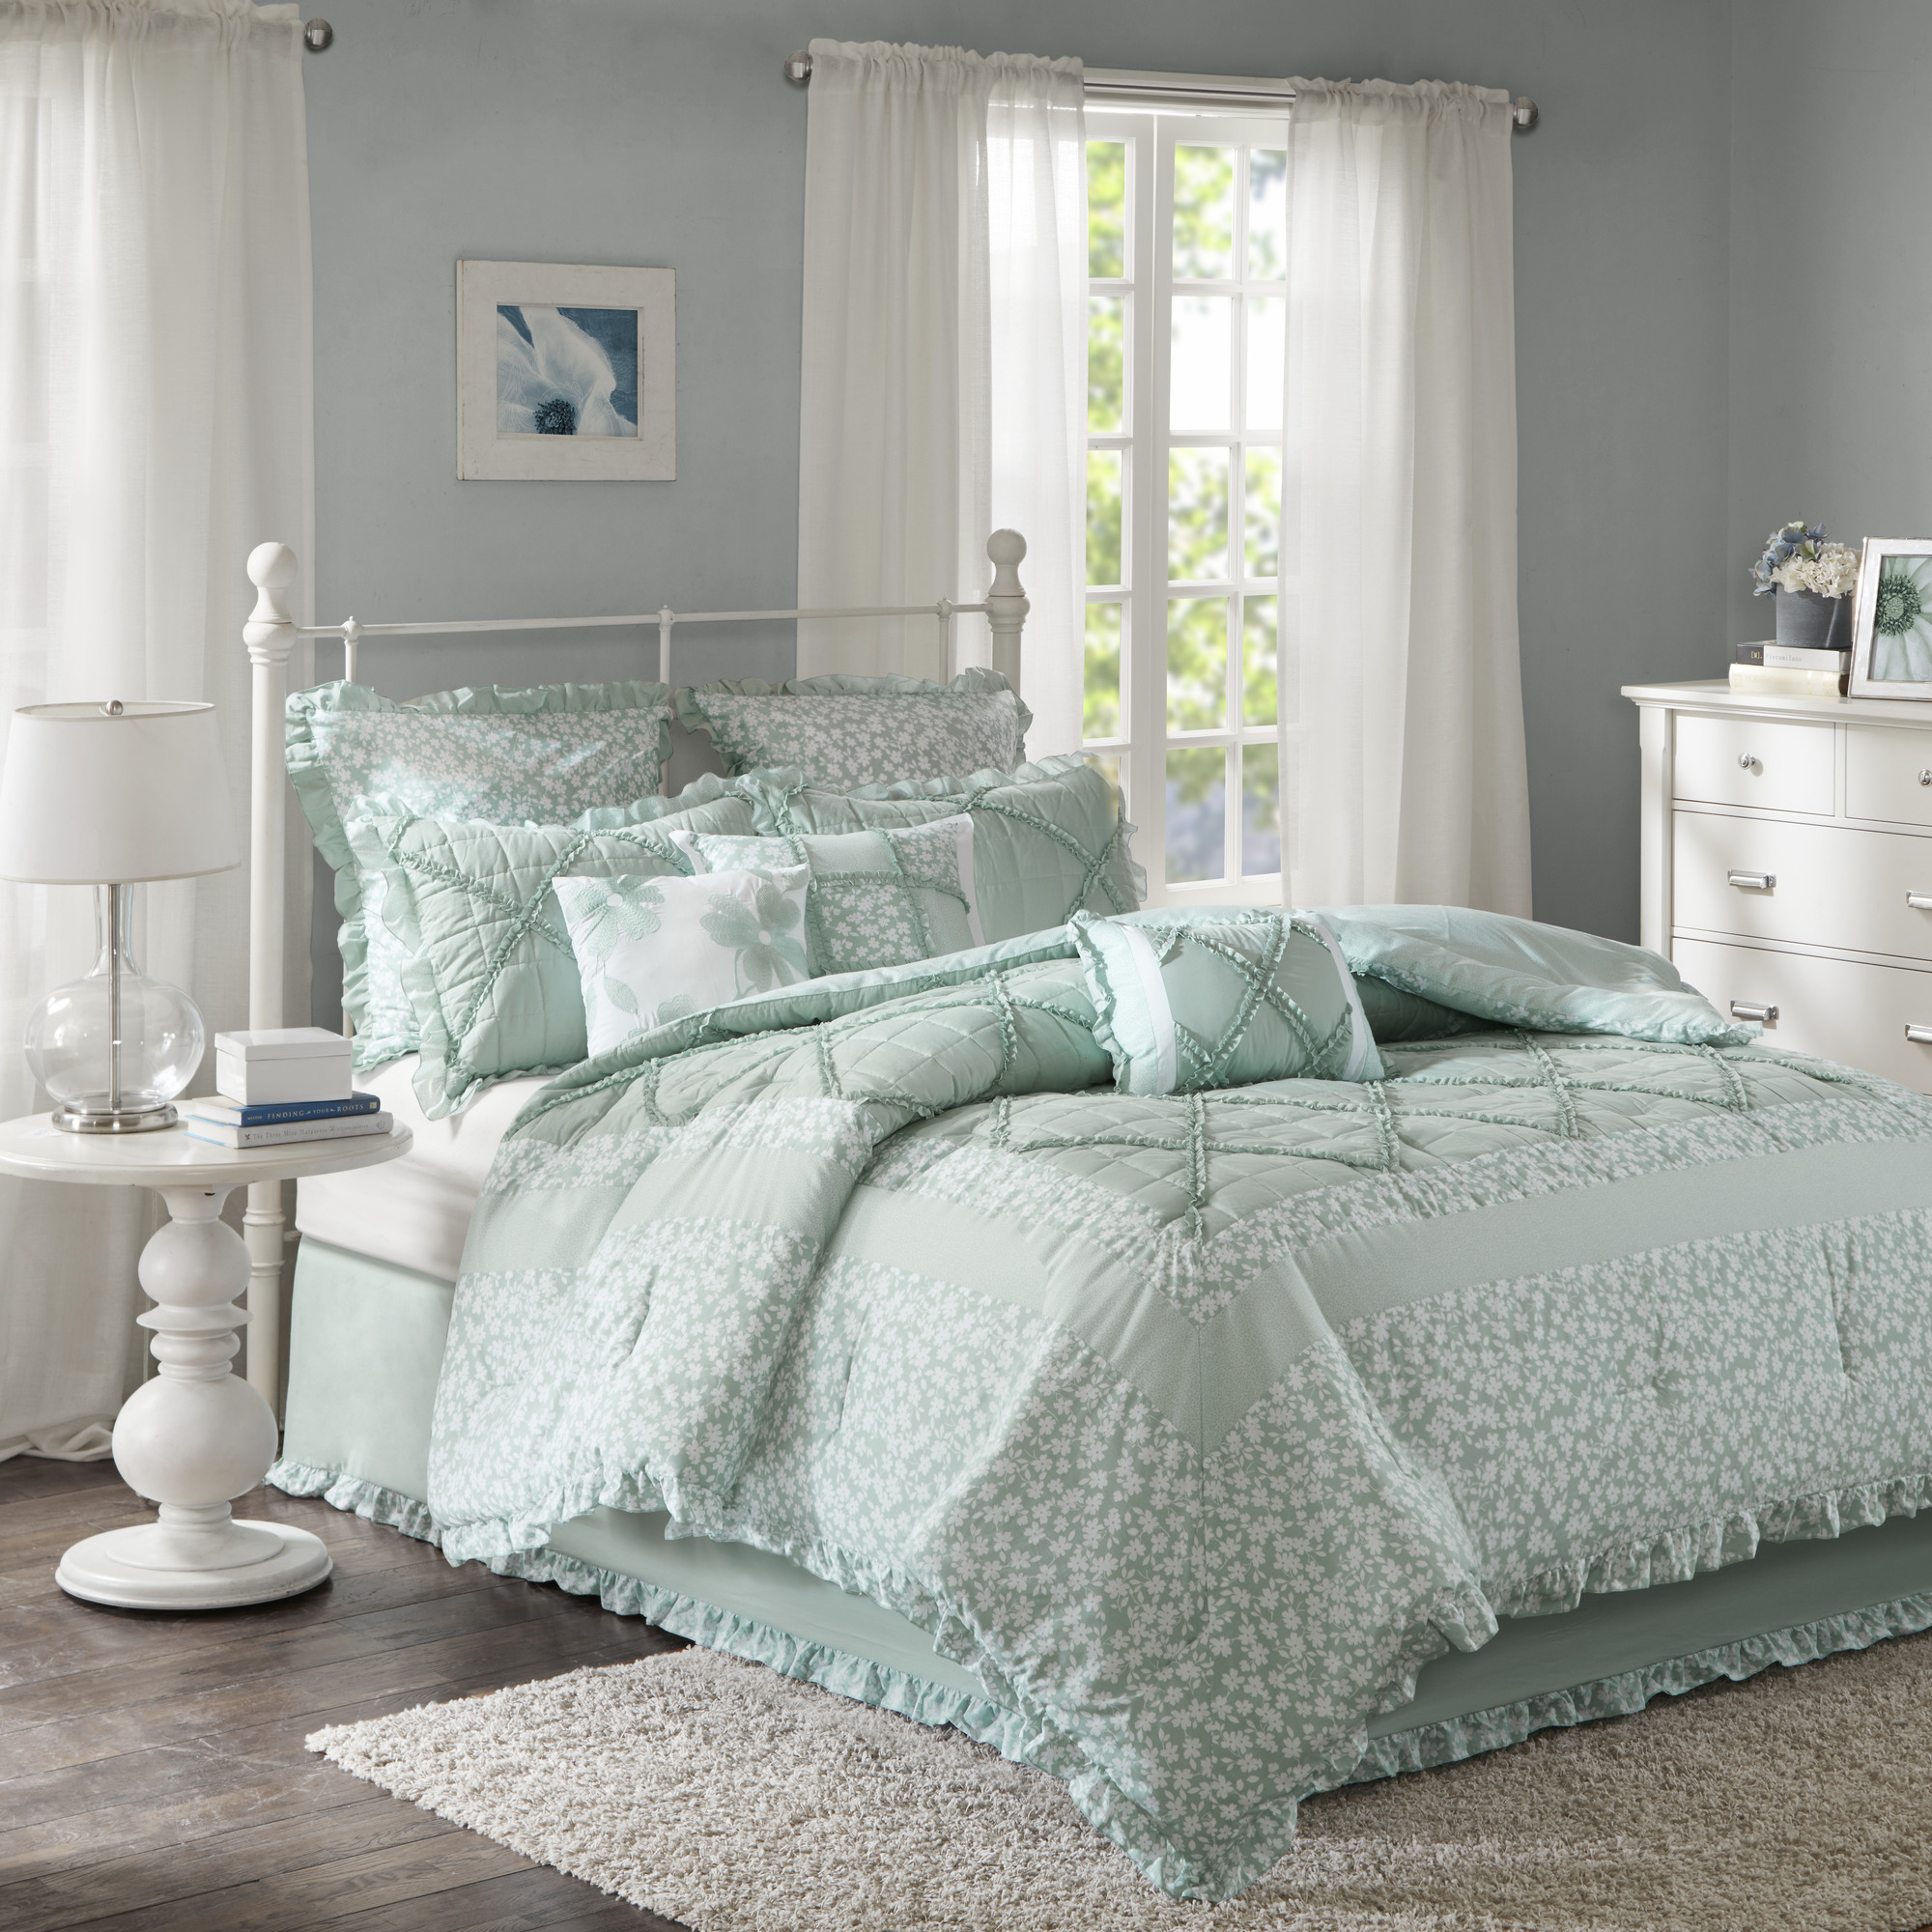 Home Essence Gretchen 9 Piece Cotton Percale Comforter Bedding Set